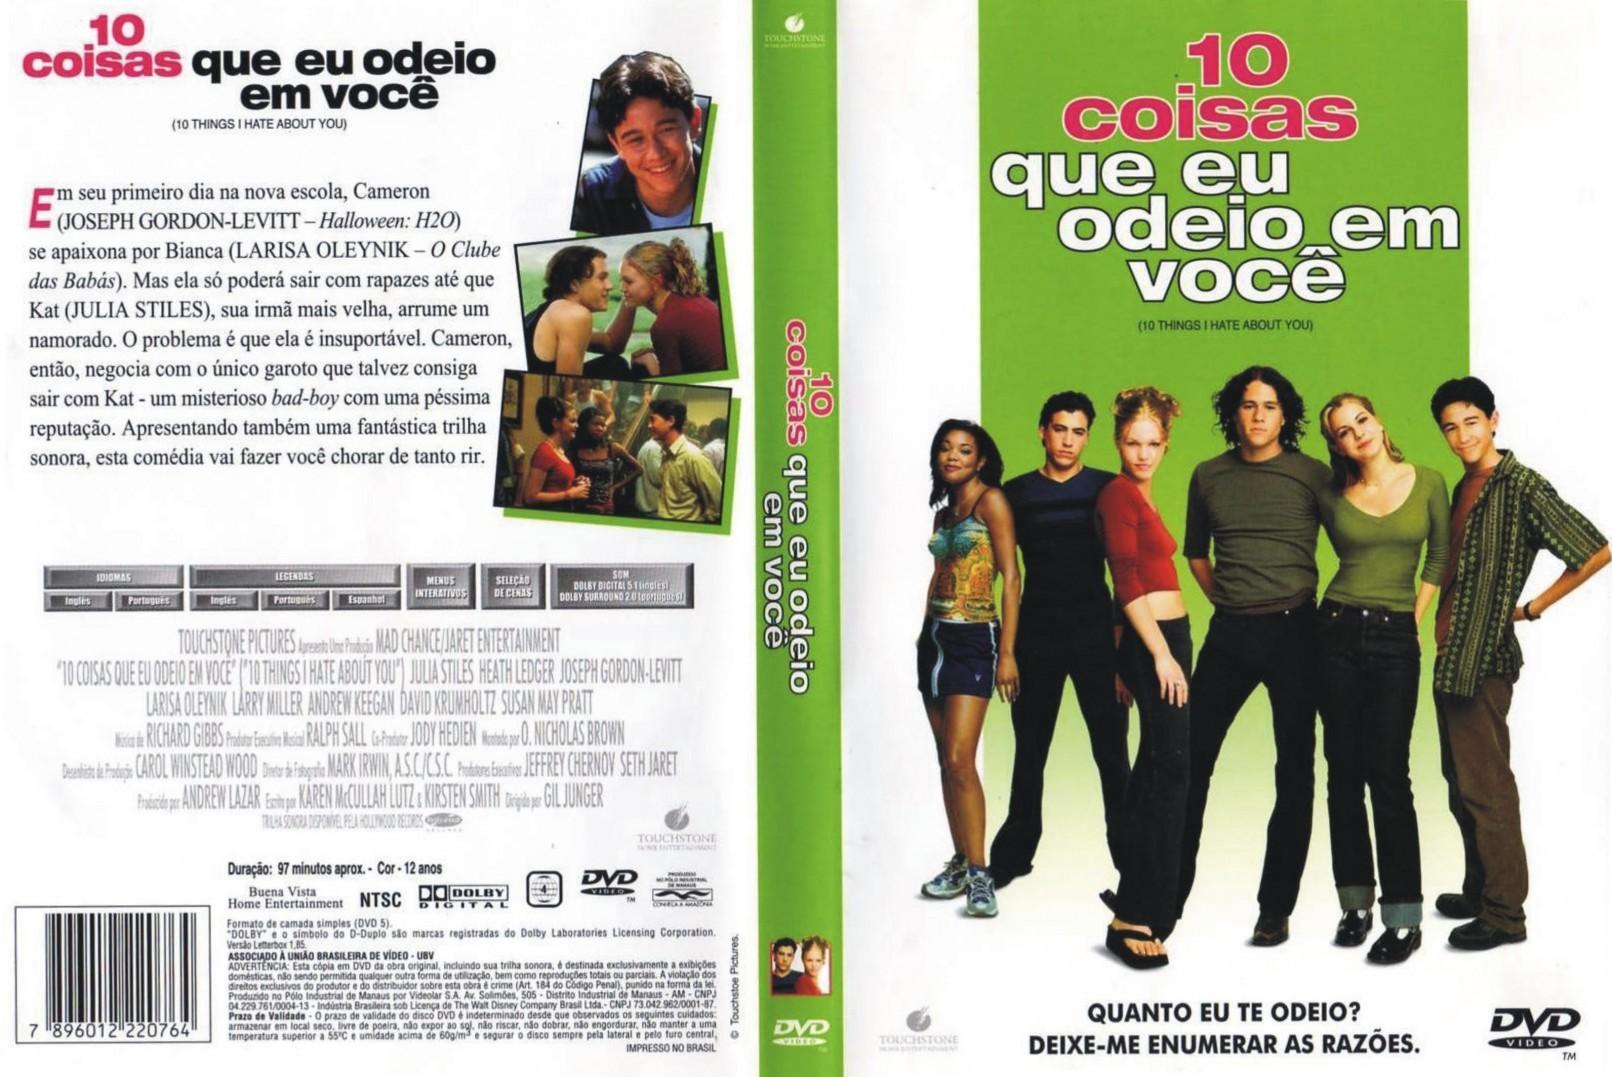 download Regêncianominal e verbal sem segredo 2009